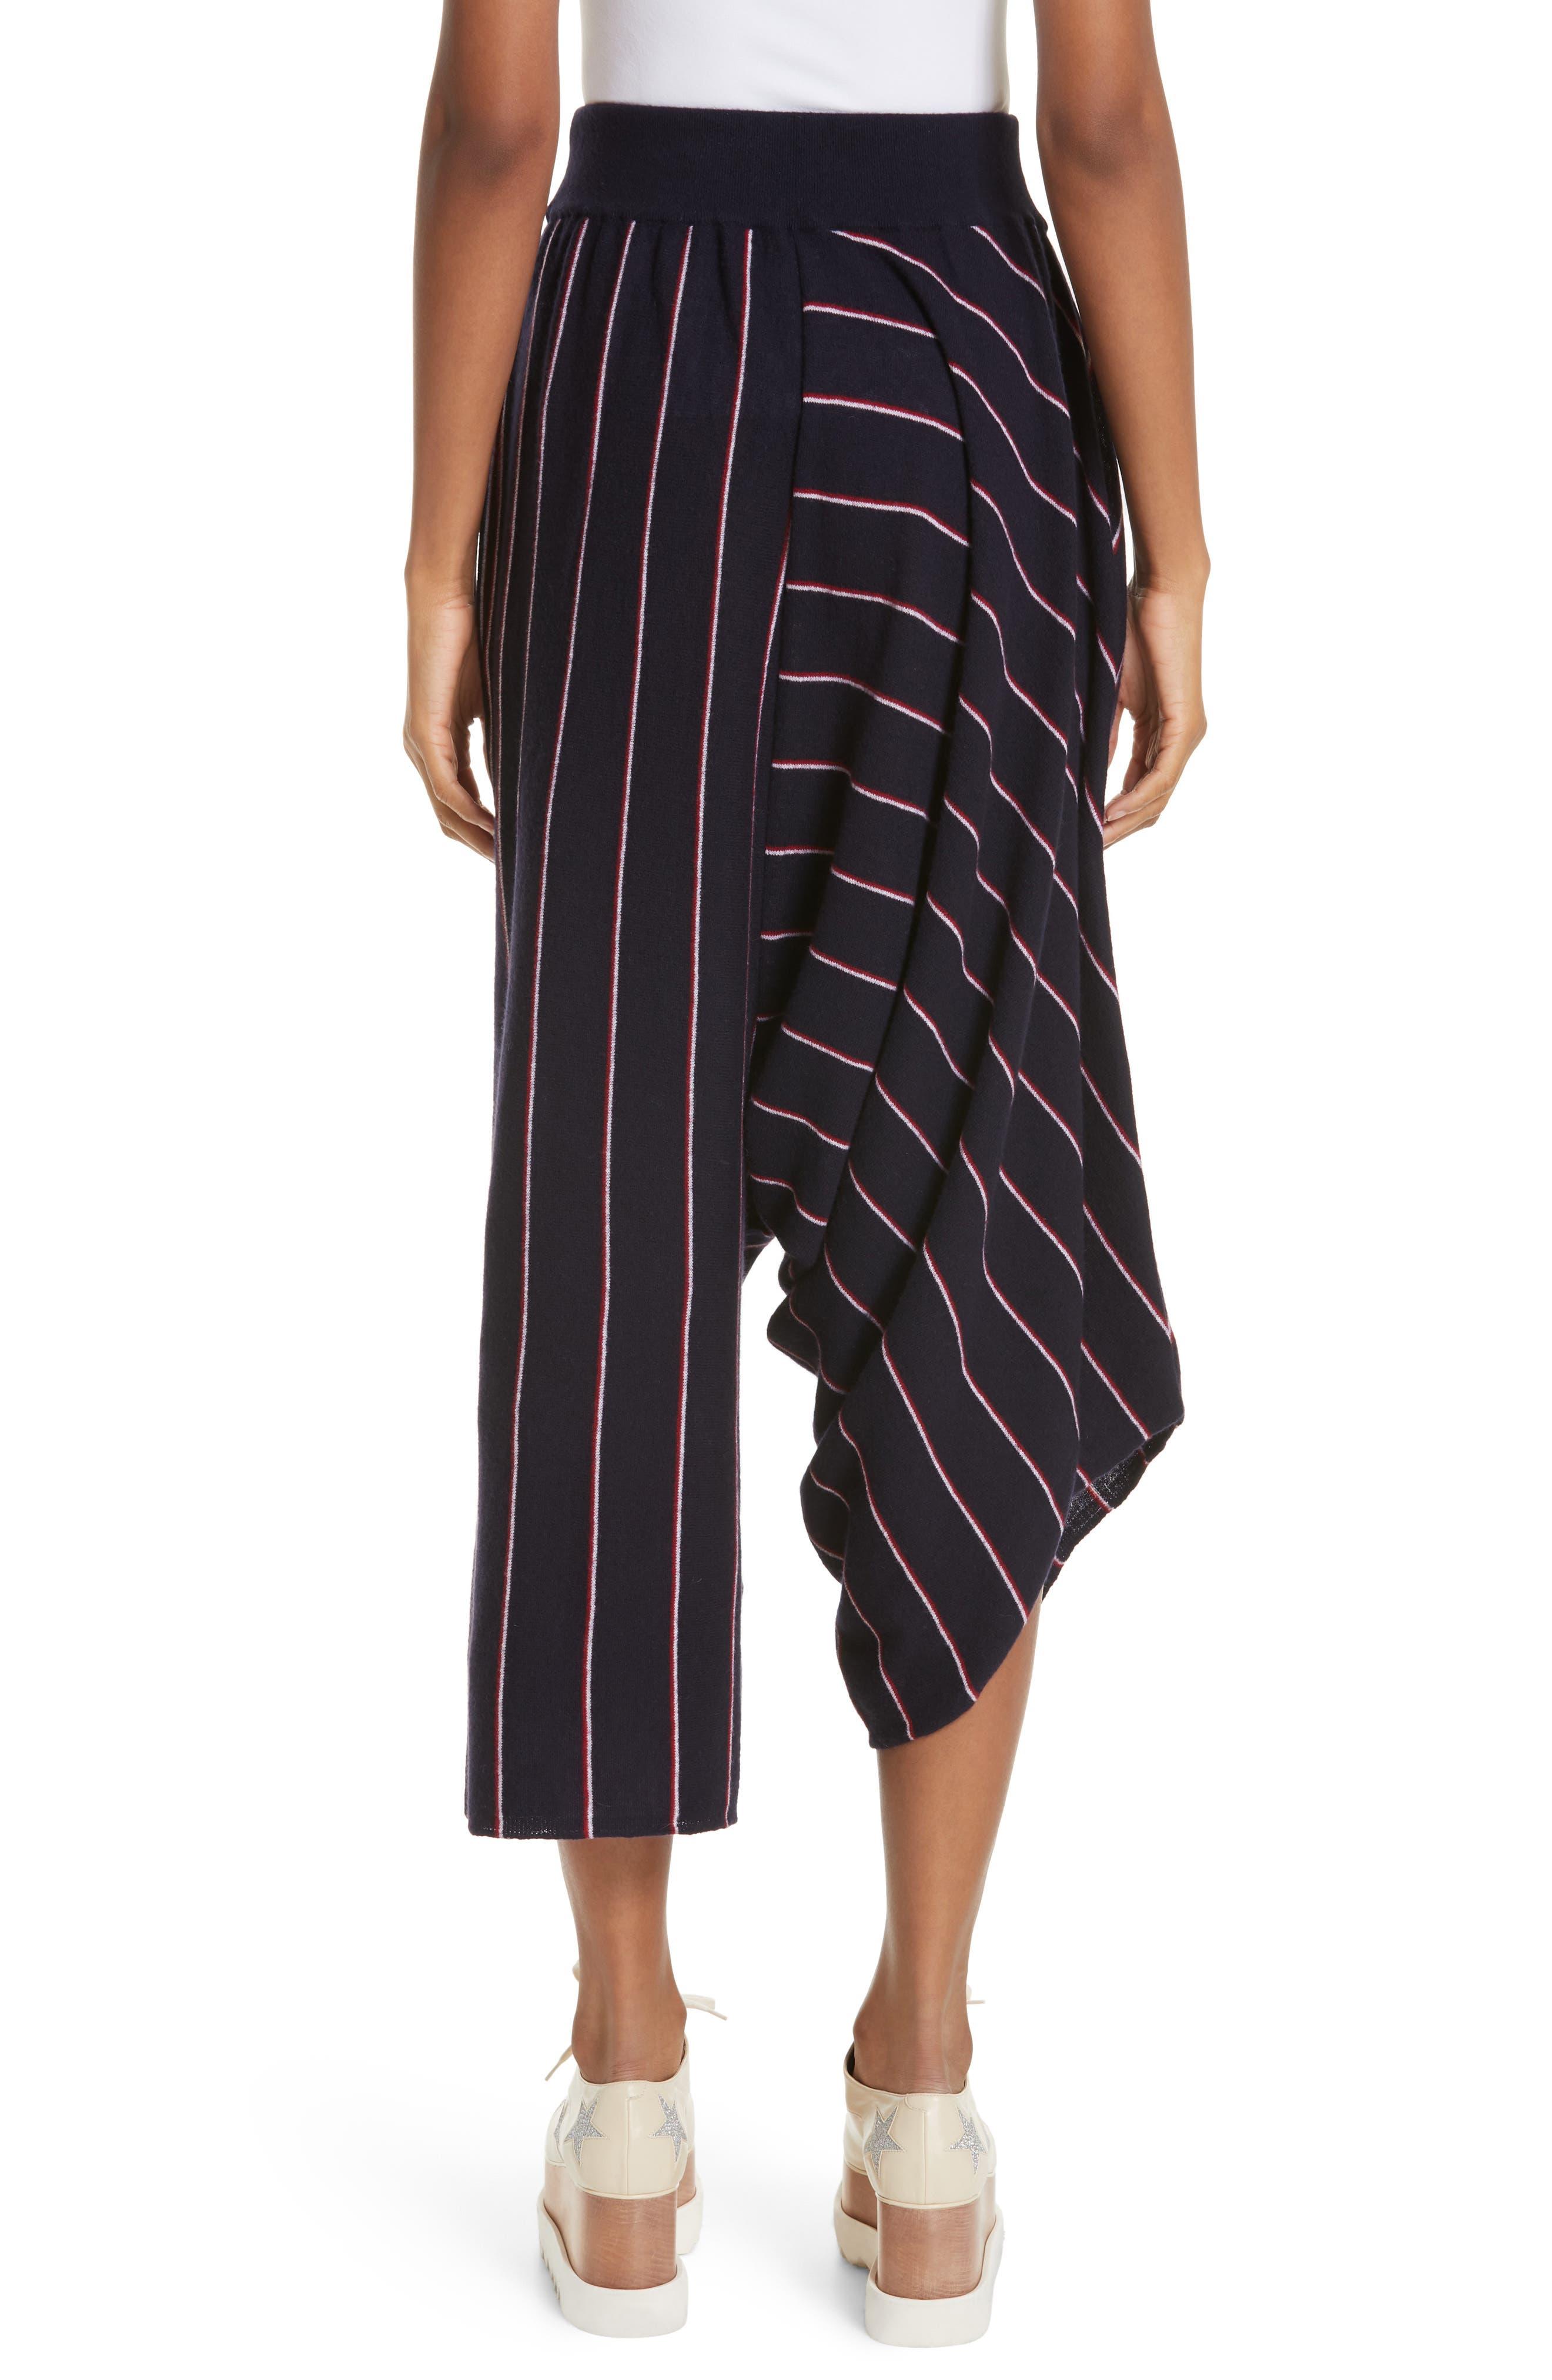 STELLA MCCARTNEY, Stripe Wool Knit Crop Pants, Alternate thumbnail 2, color, INK